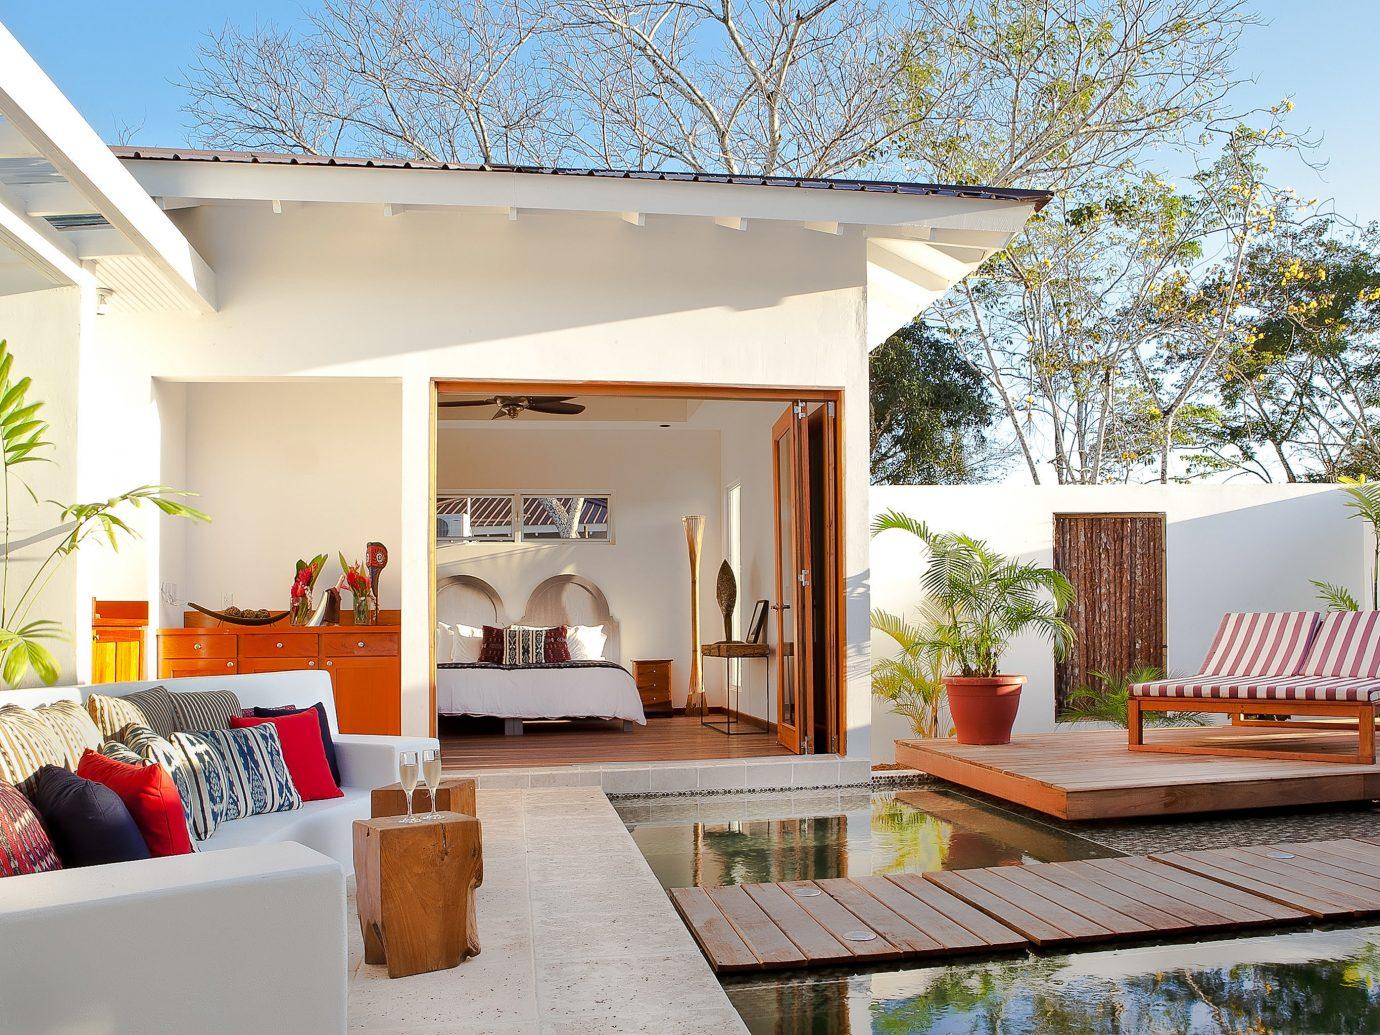 Private Pool at Ka'ana Resort, San Ignacio, Belize